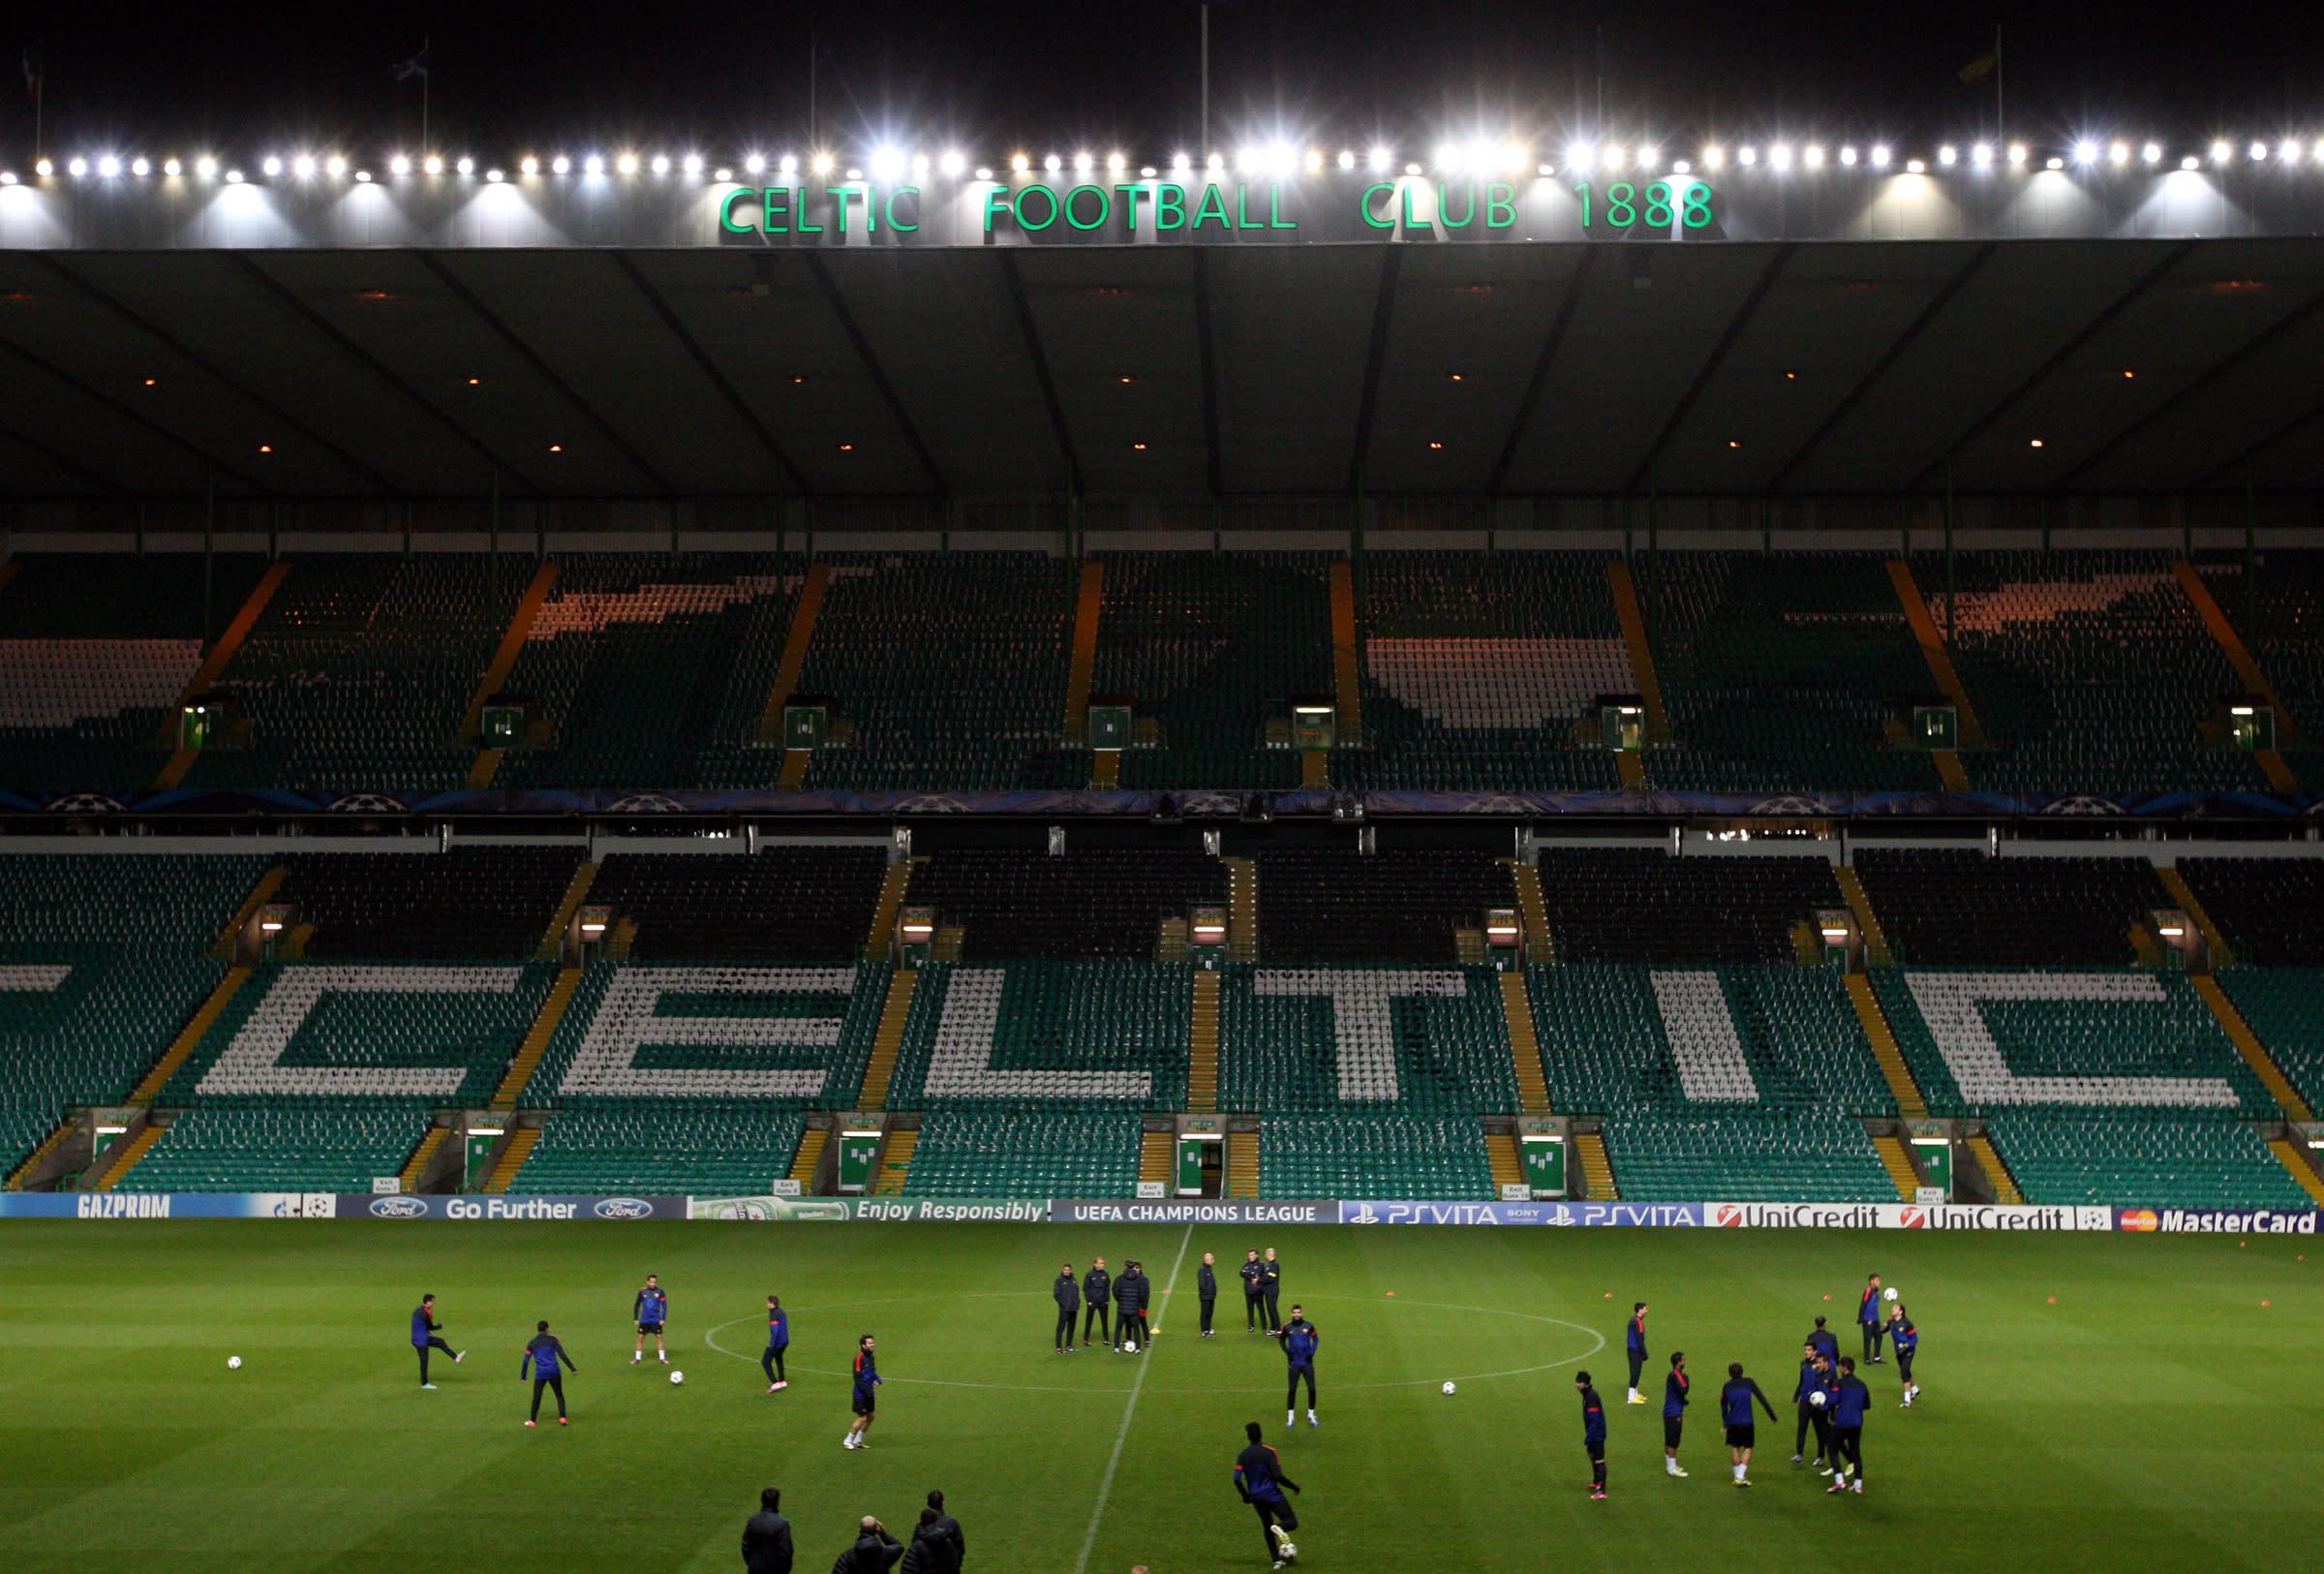 Man, 20, seriously assaulted near Celtic Park stadium